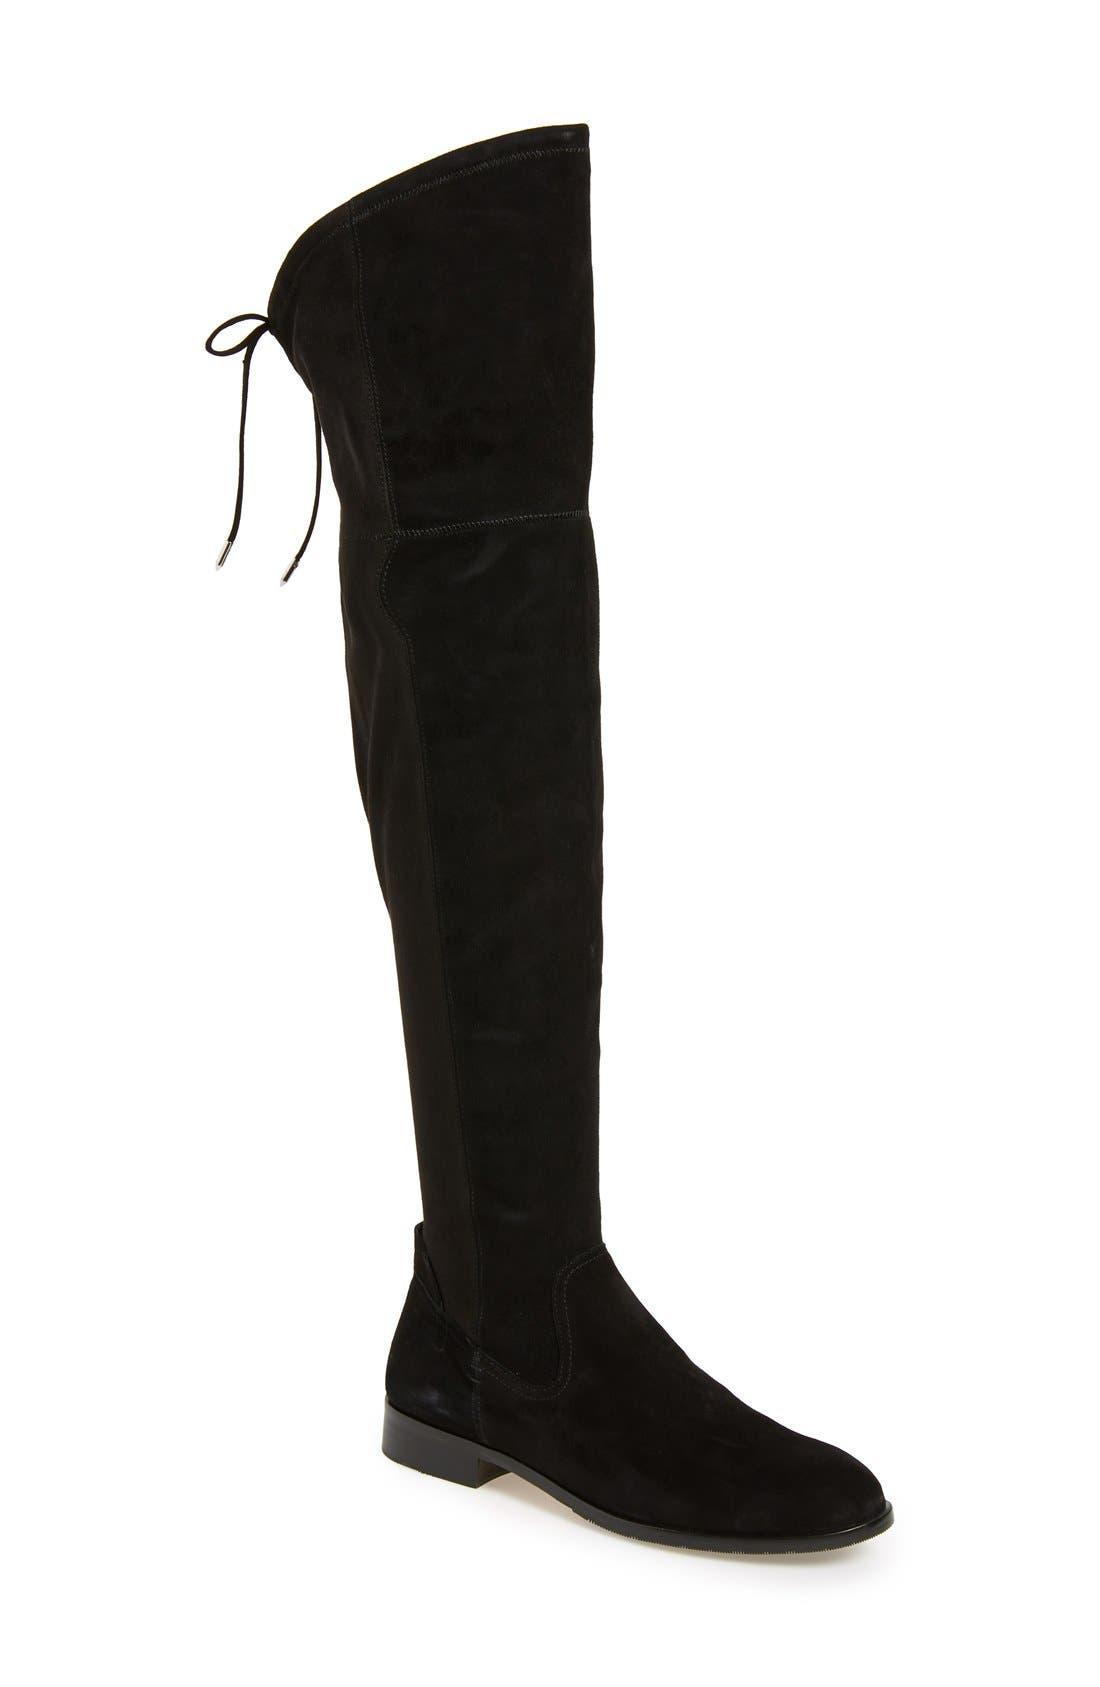 Alternate Image 1 Selected - Dolce Vita 'Neely' Over the Knee Boot (Women)